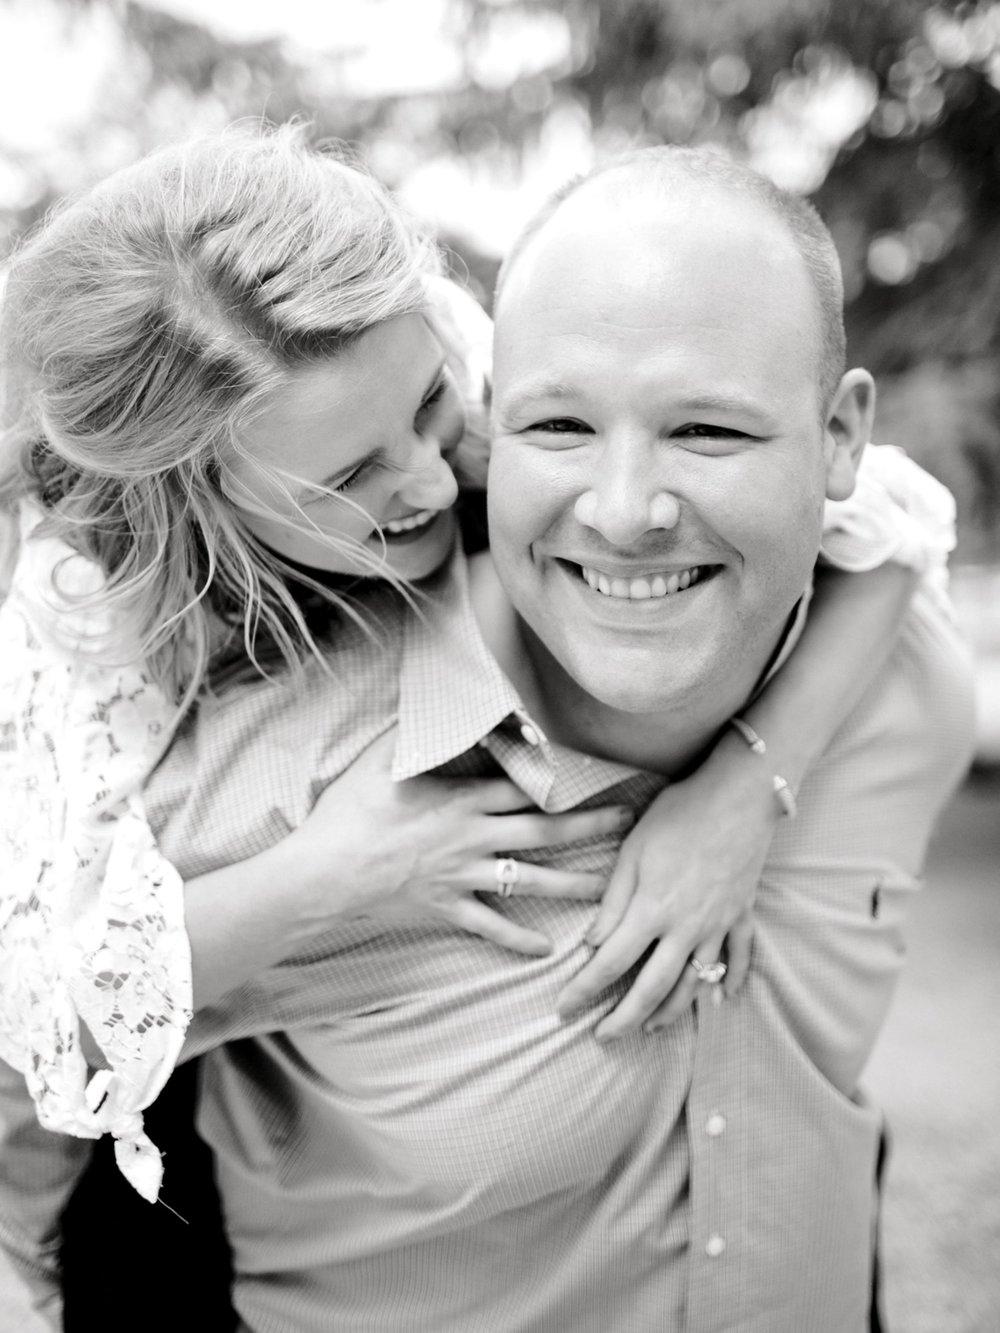 Morgan_and_Chris_Hebert_ALLEEJ_Engagement_Photographer_Lubbock_0044.jpg